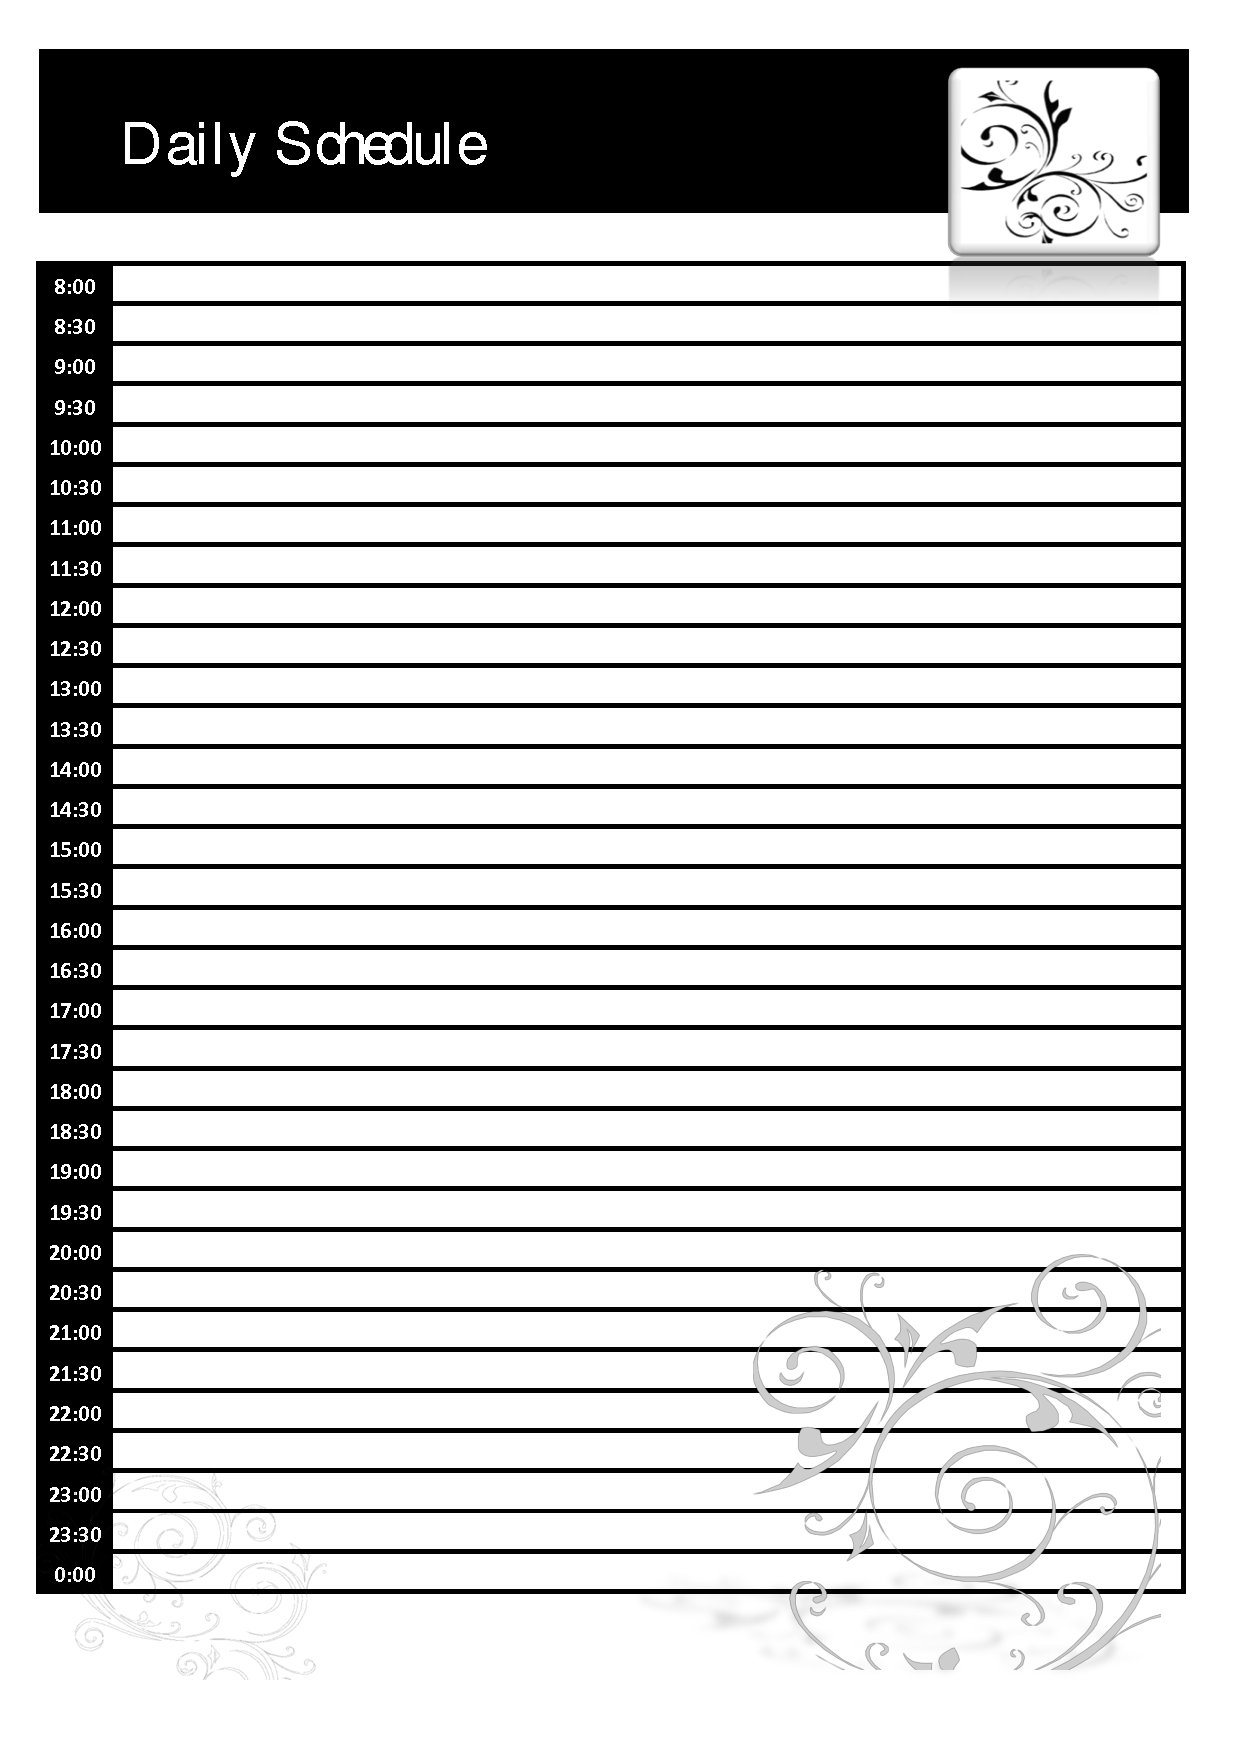 Daily Calendar Template Blank | Daily Calendar Printable 2019